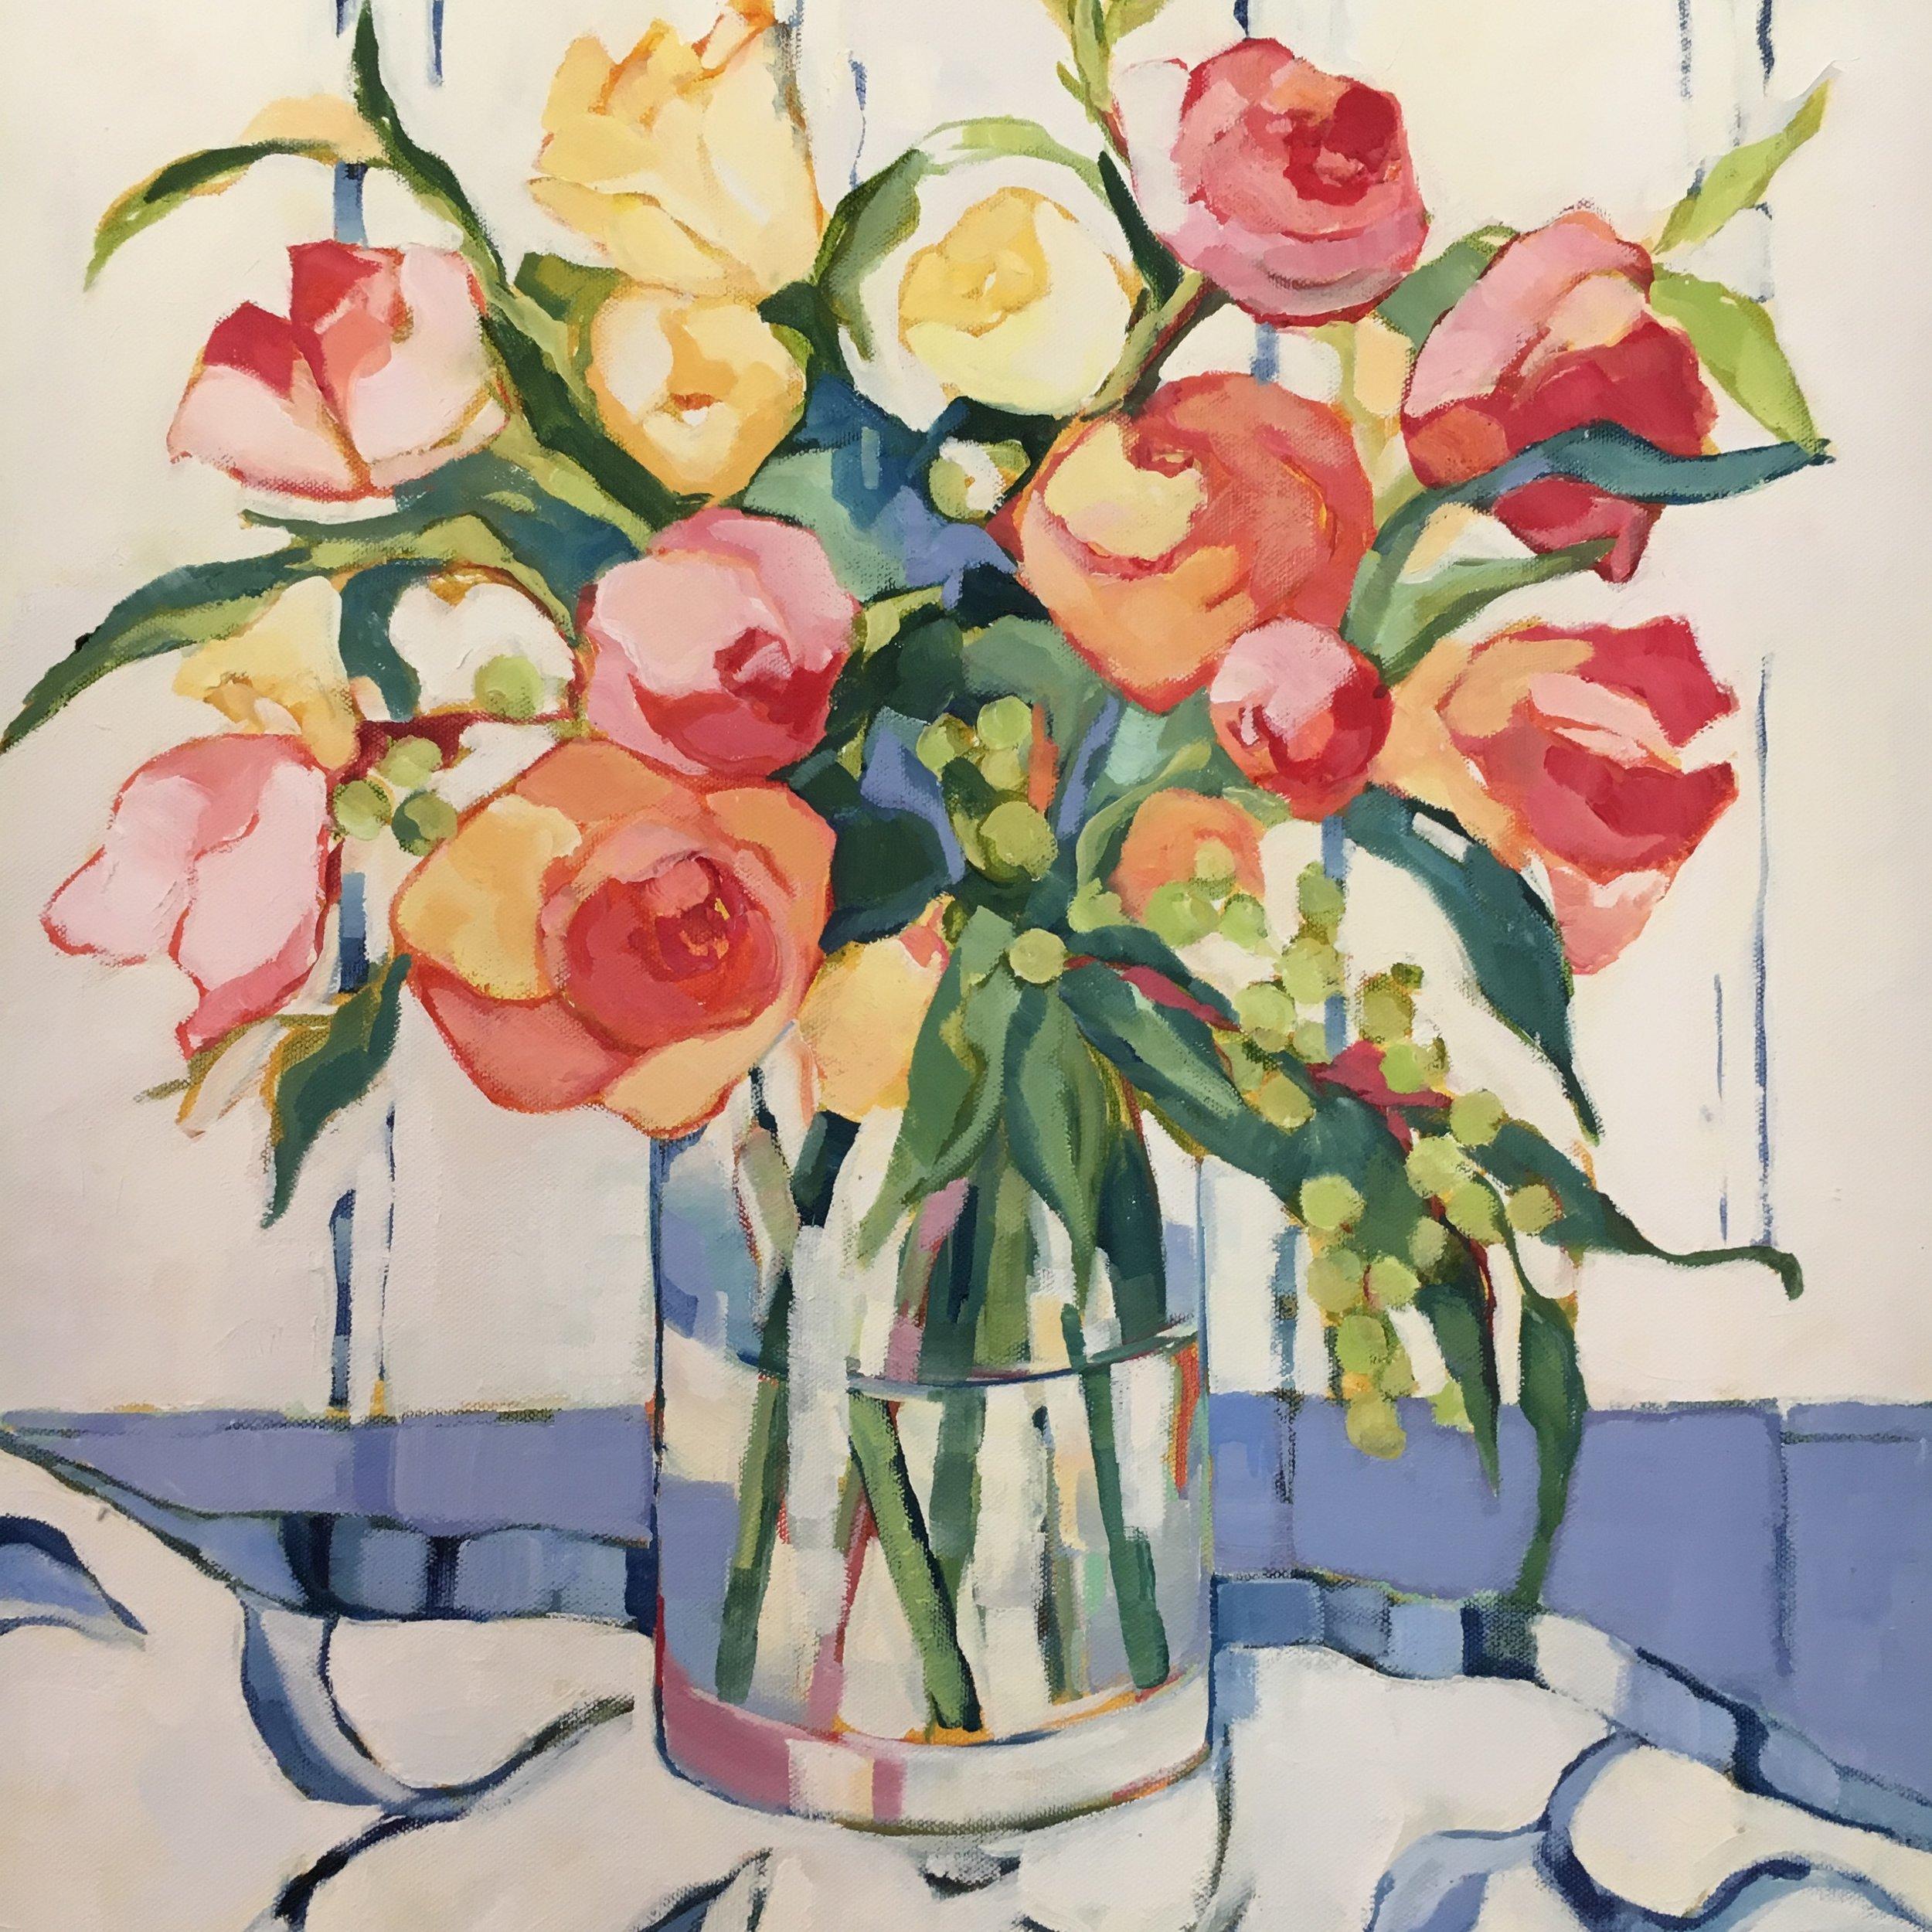 "Spring Still Life,oil on canvas, 24x24"" SOLD"